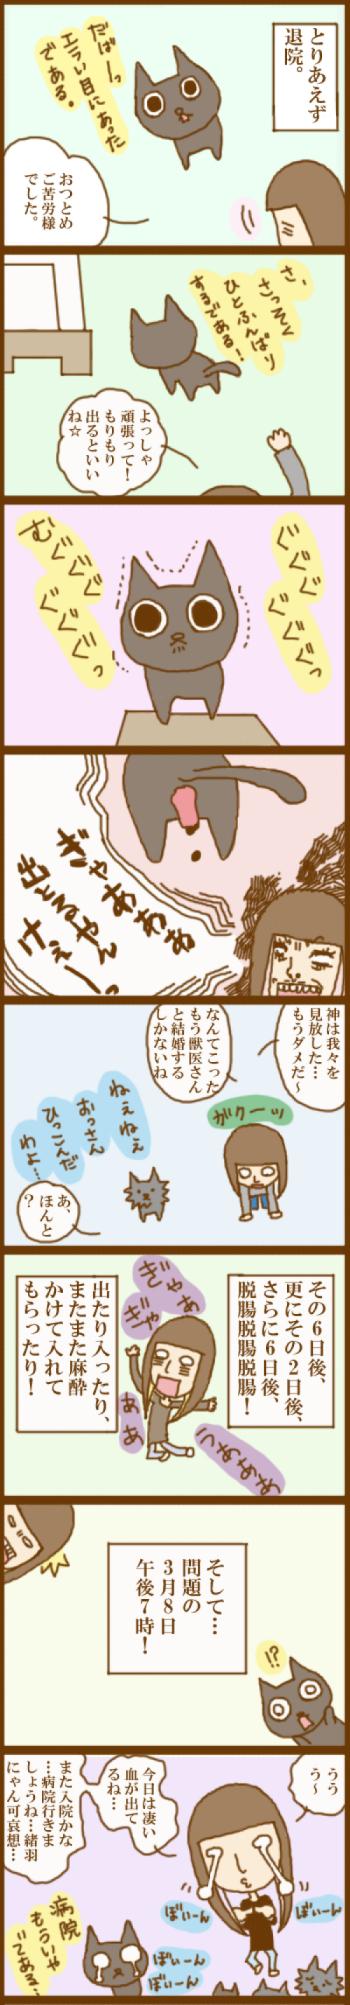 f:id:suzuokayu:20201116114208j:plain